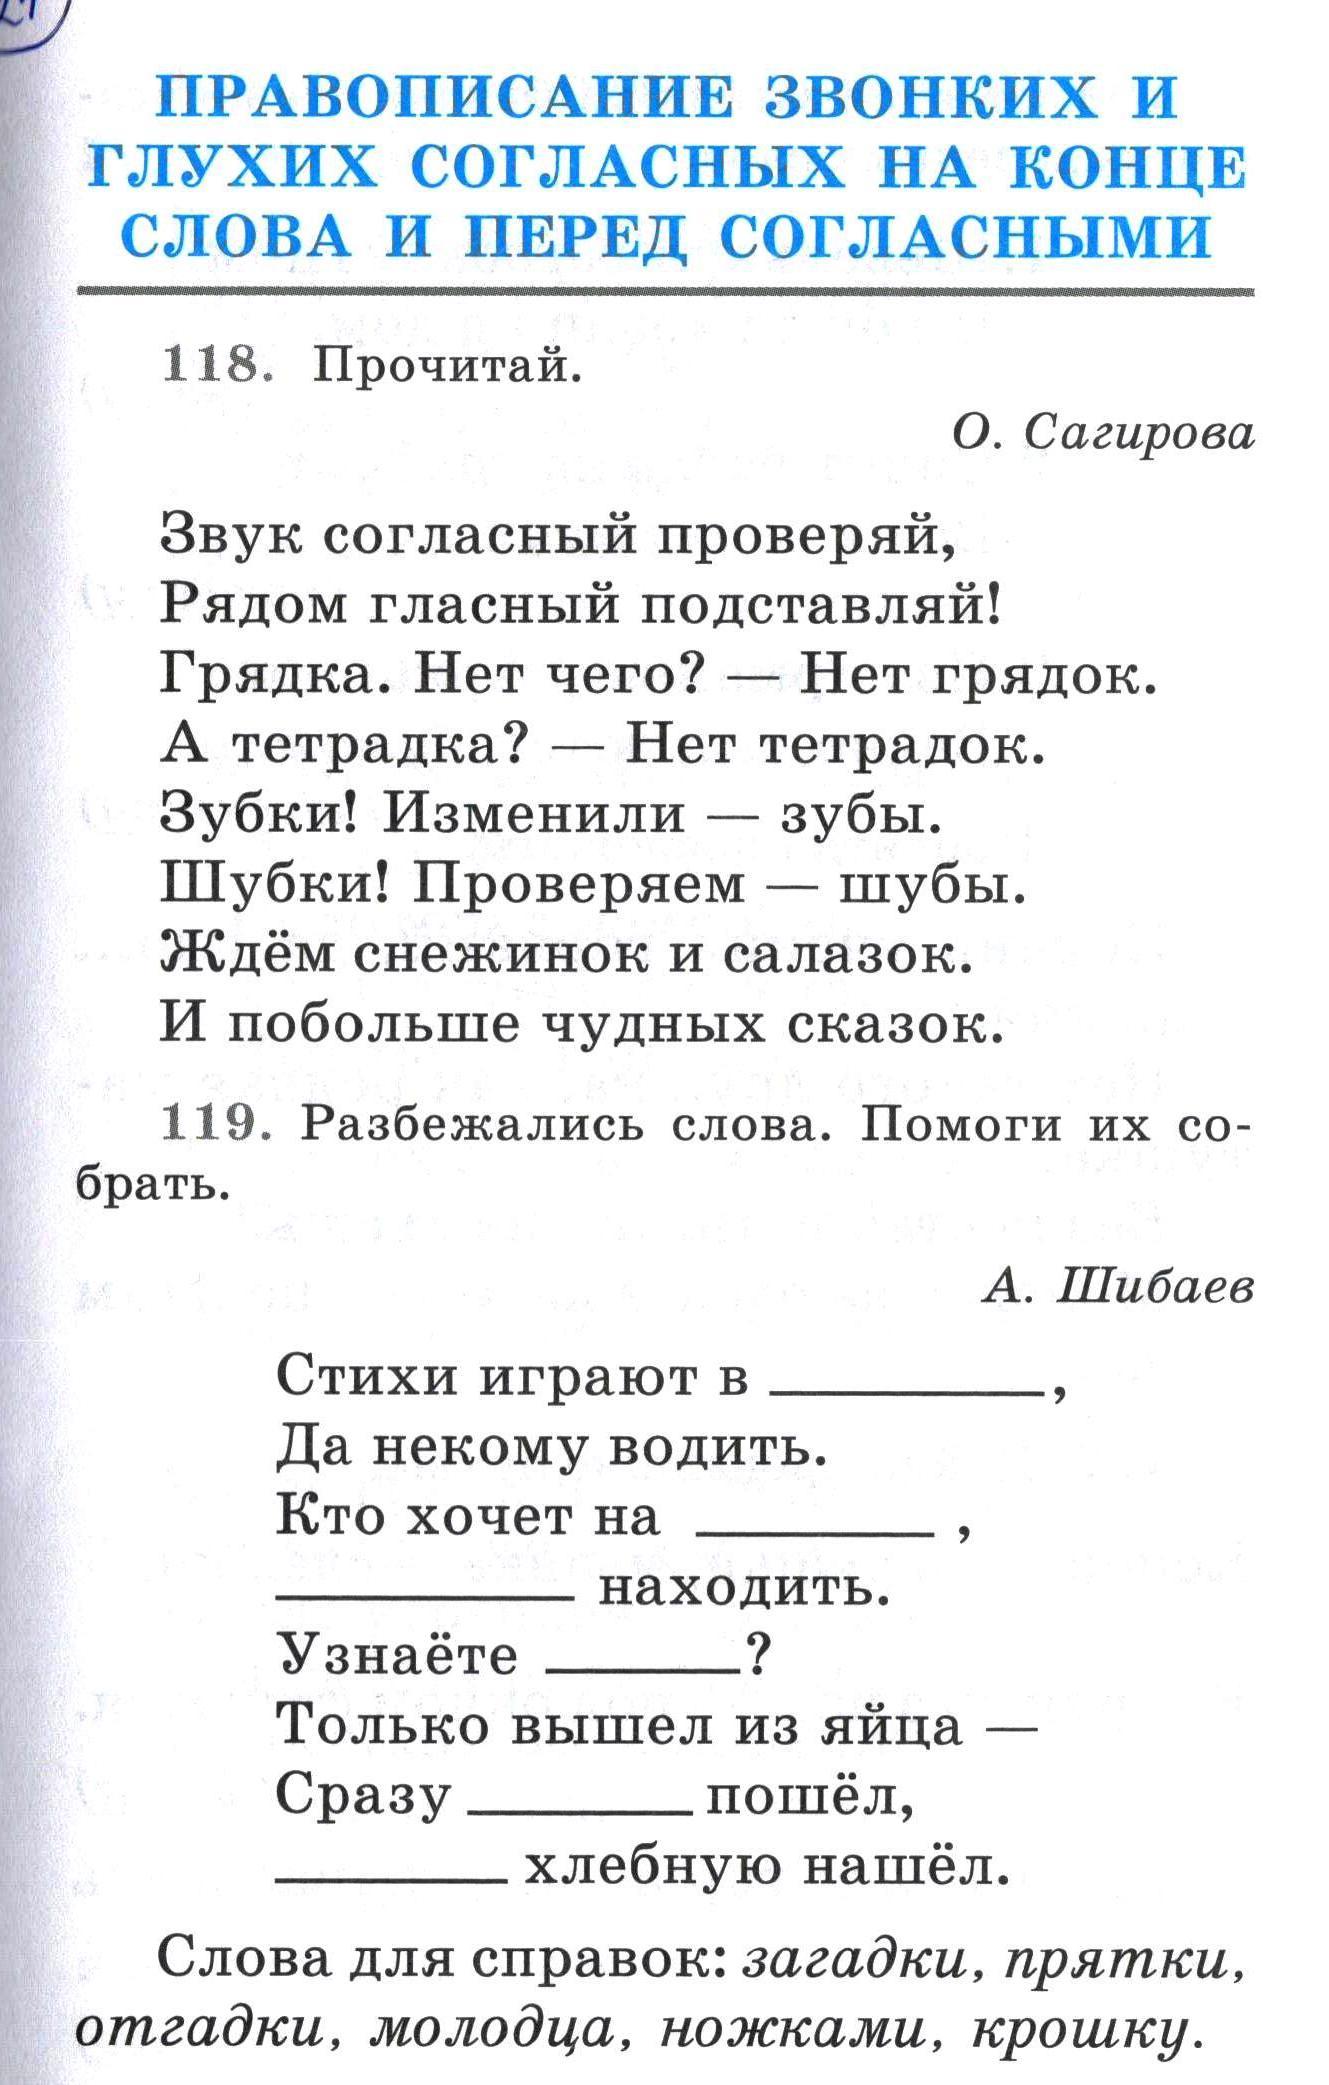 п 006.jpg